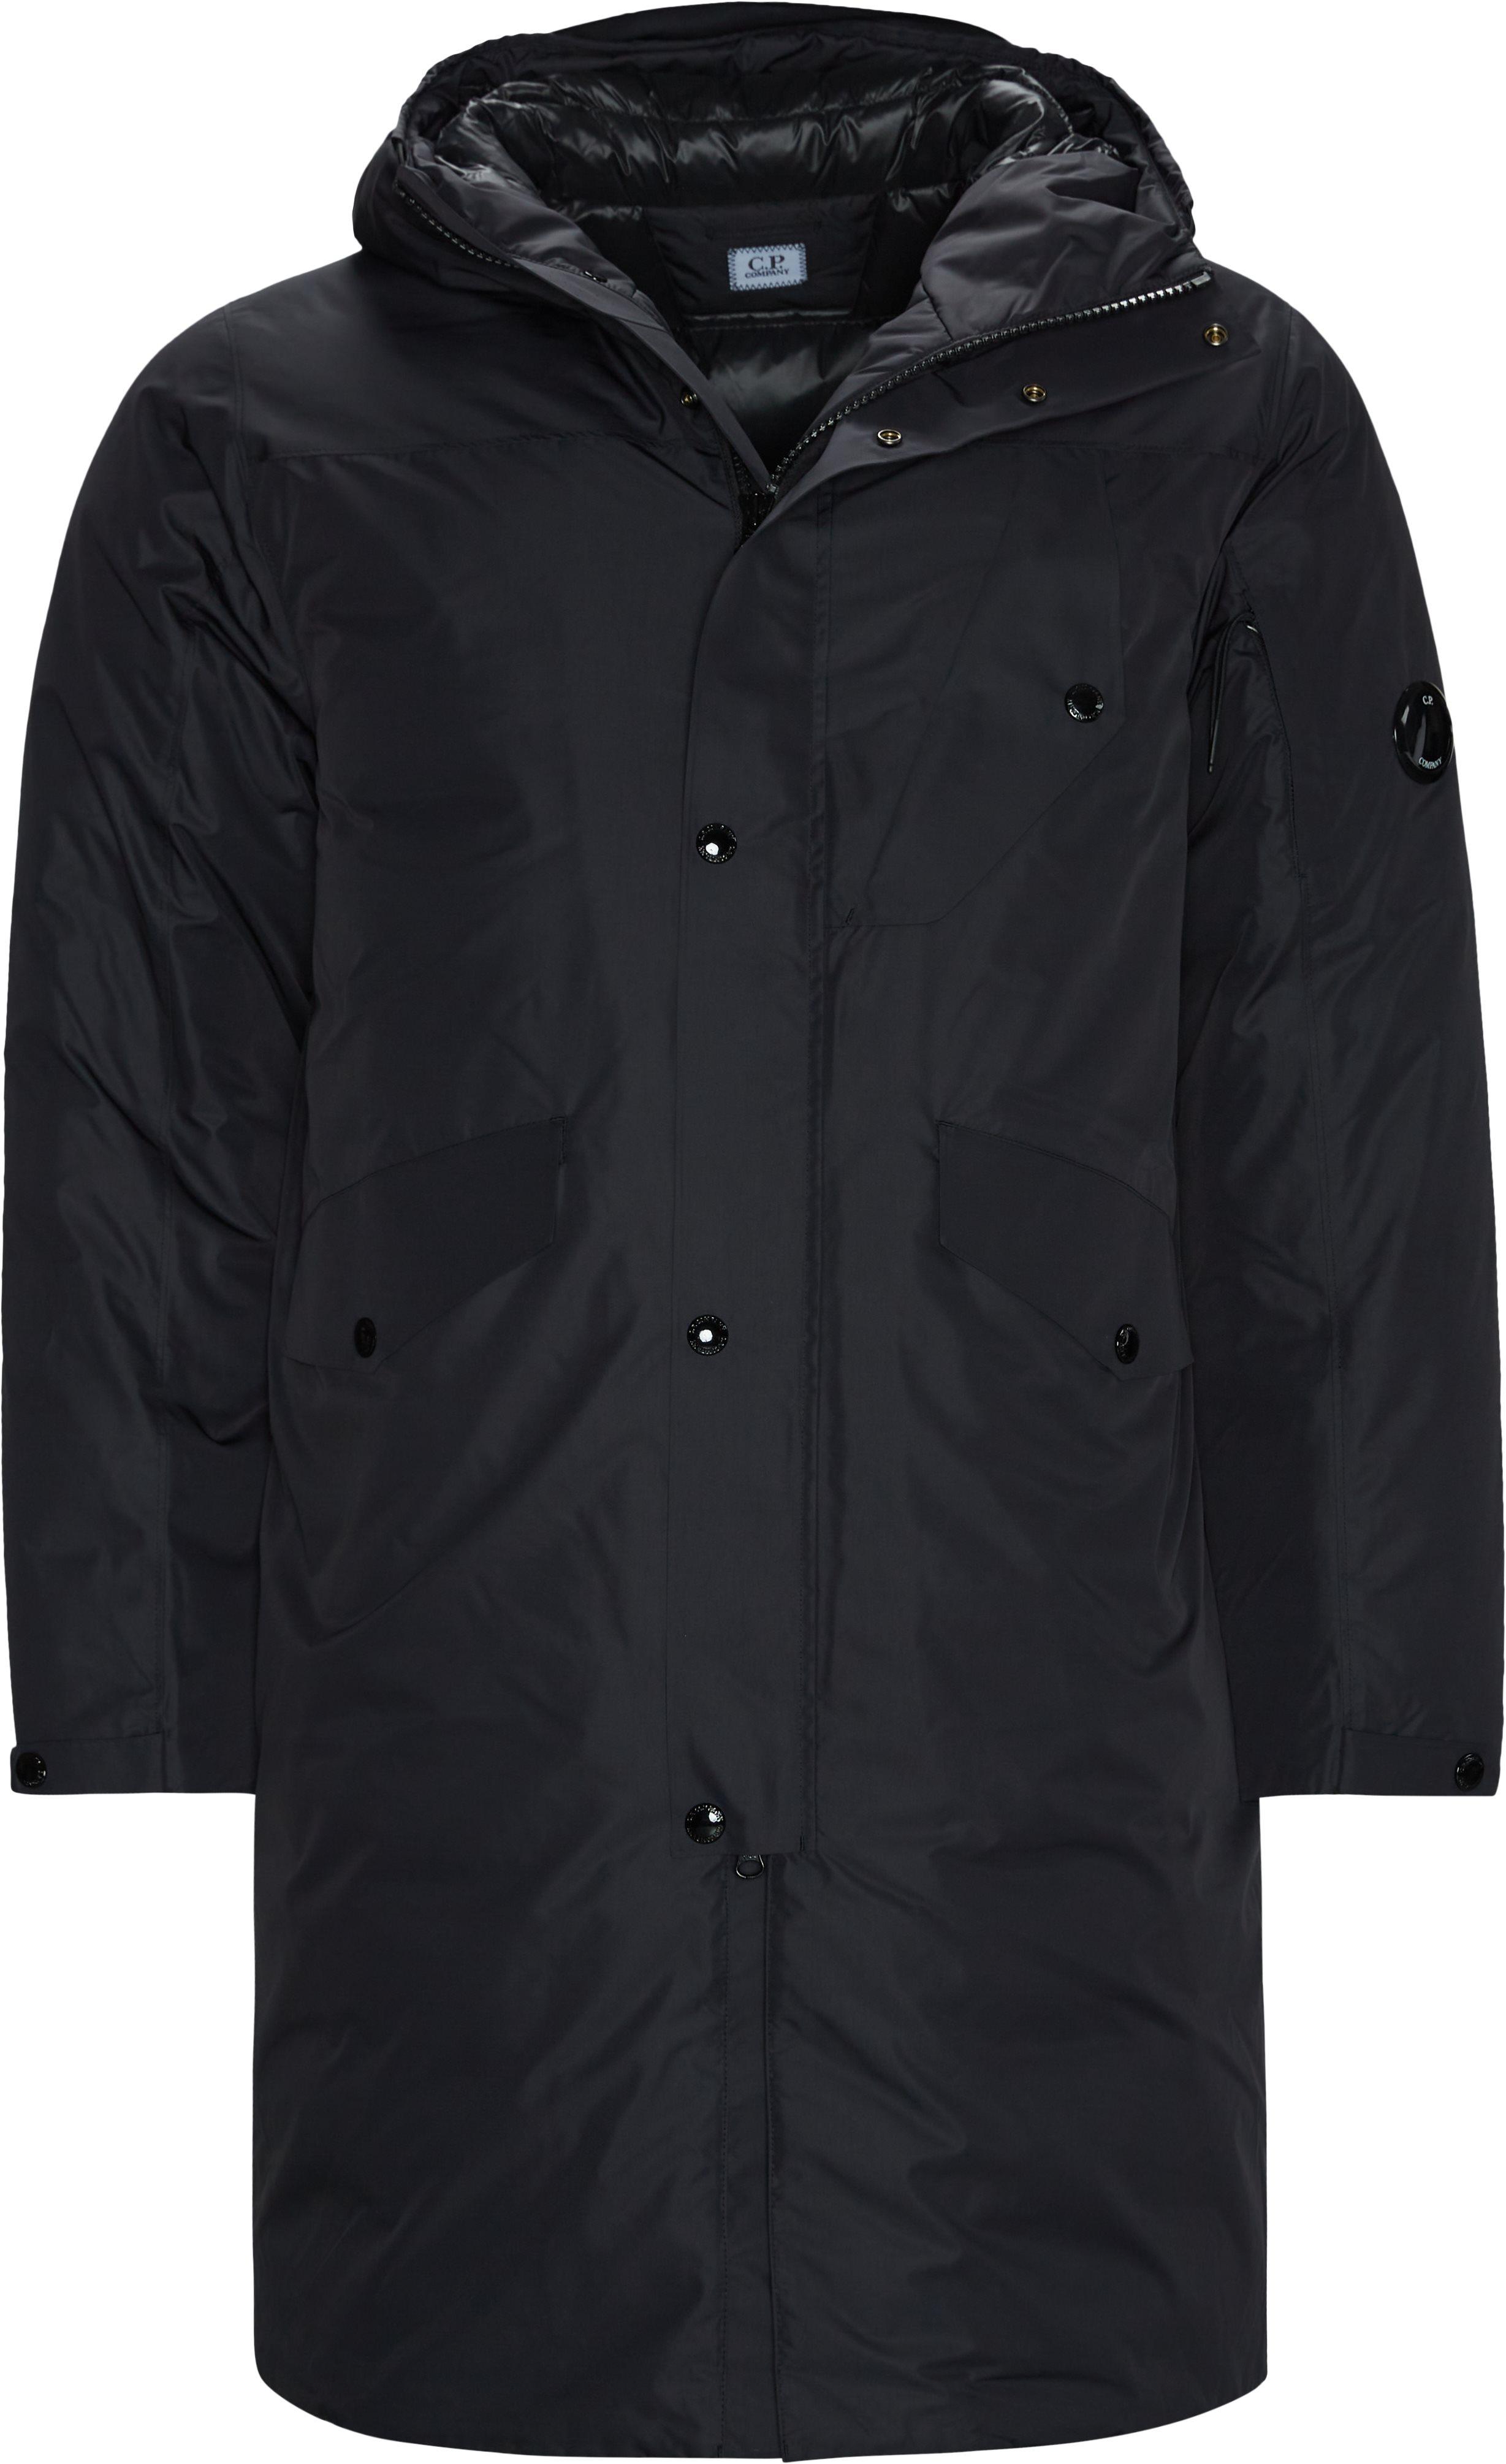 Down Jacket - Jakker - Regular fit - Sort